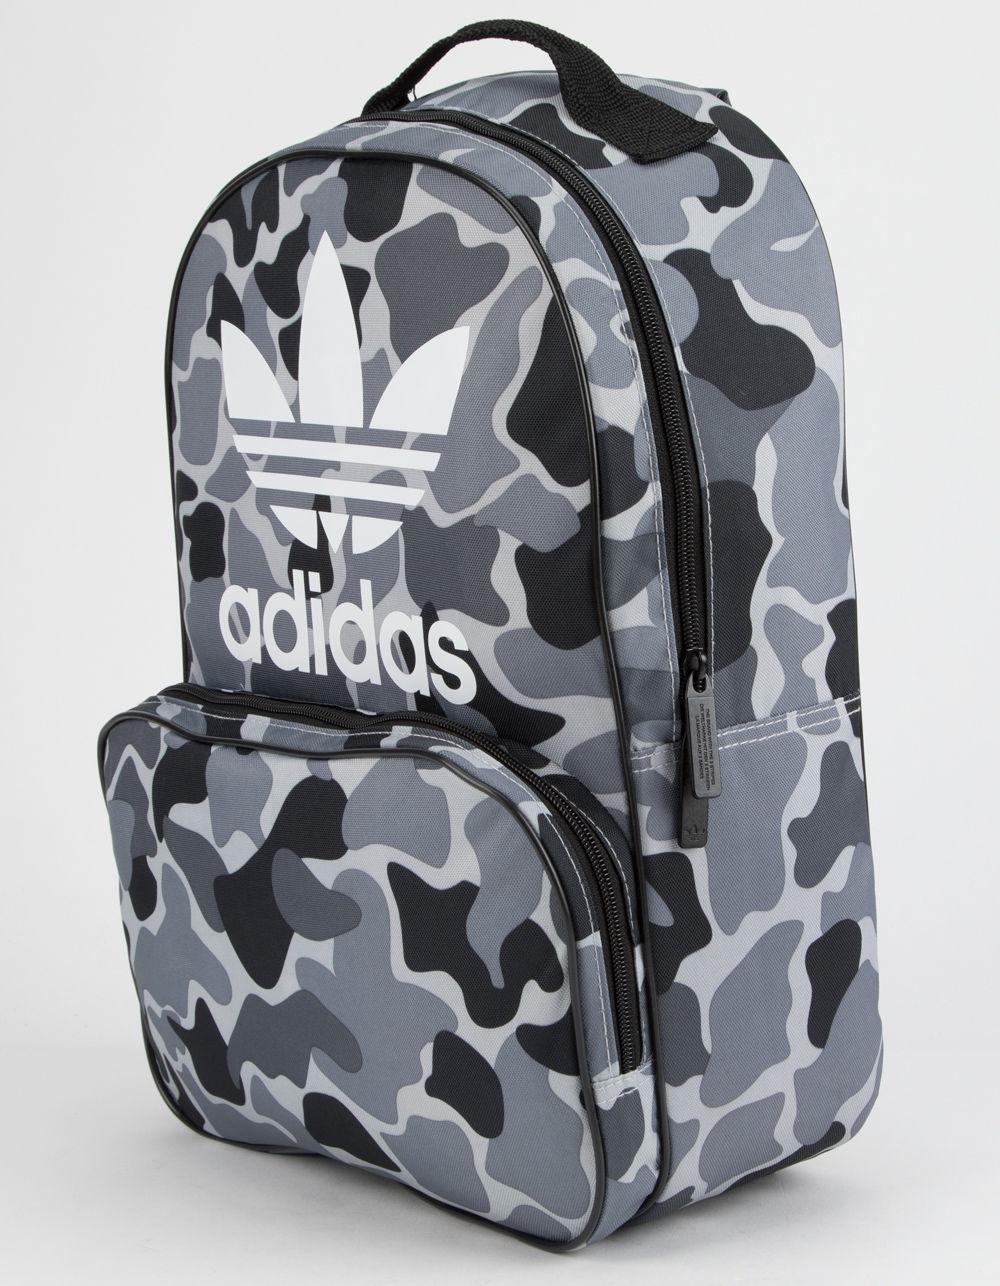 Lyst - adidas Originals Santiago Black Camo Backpack in Black for Men 9635559682682